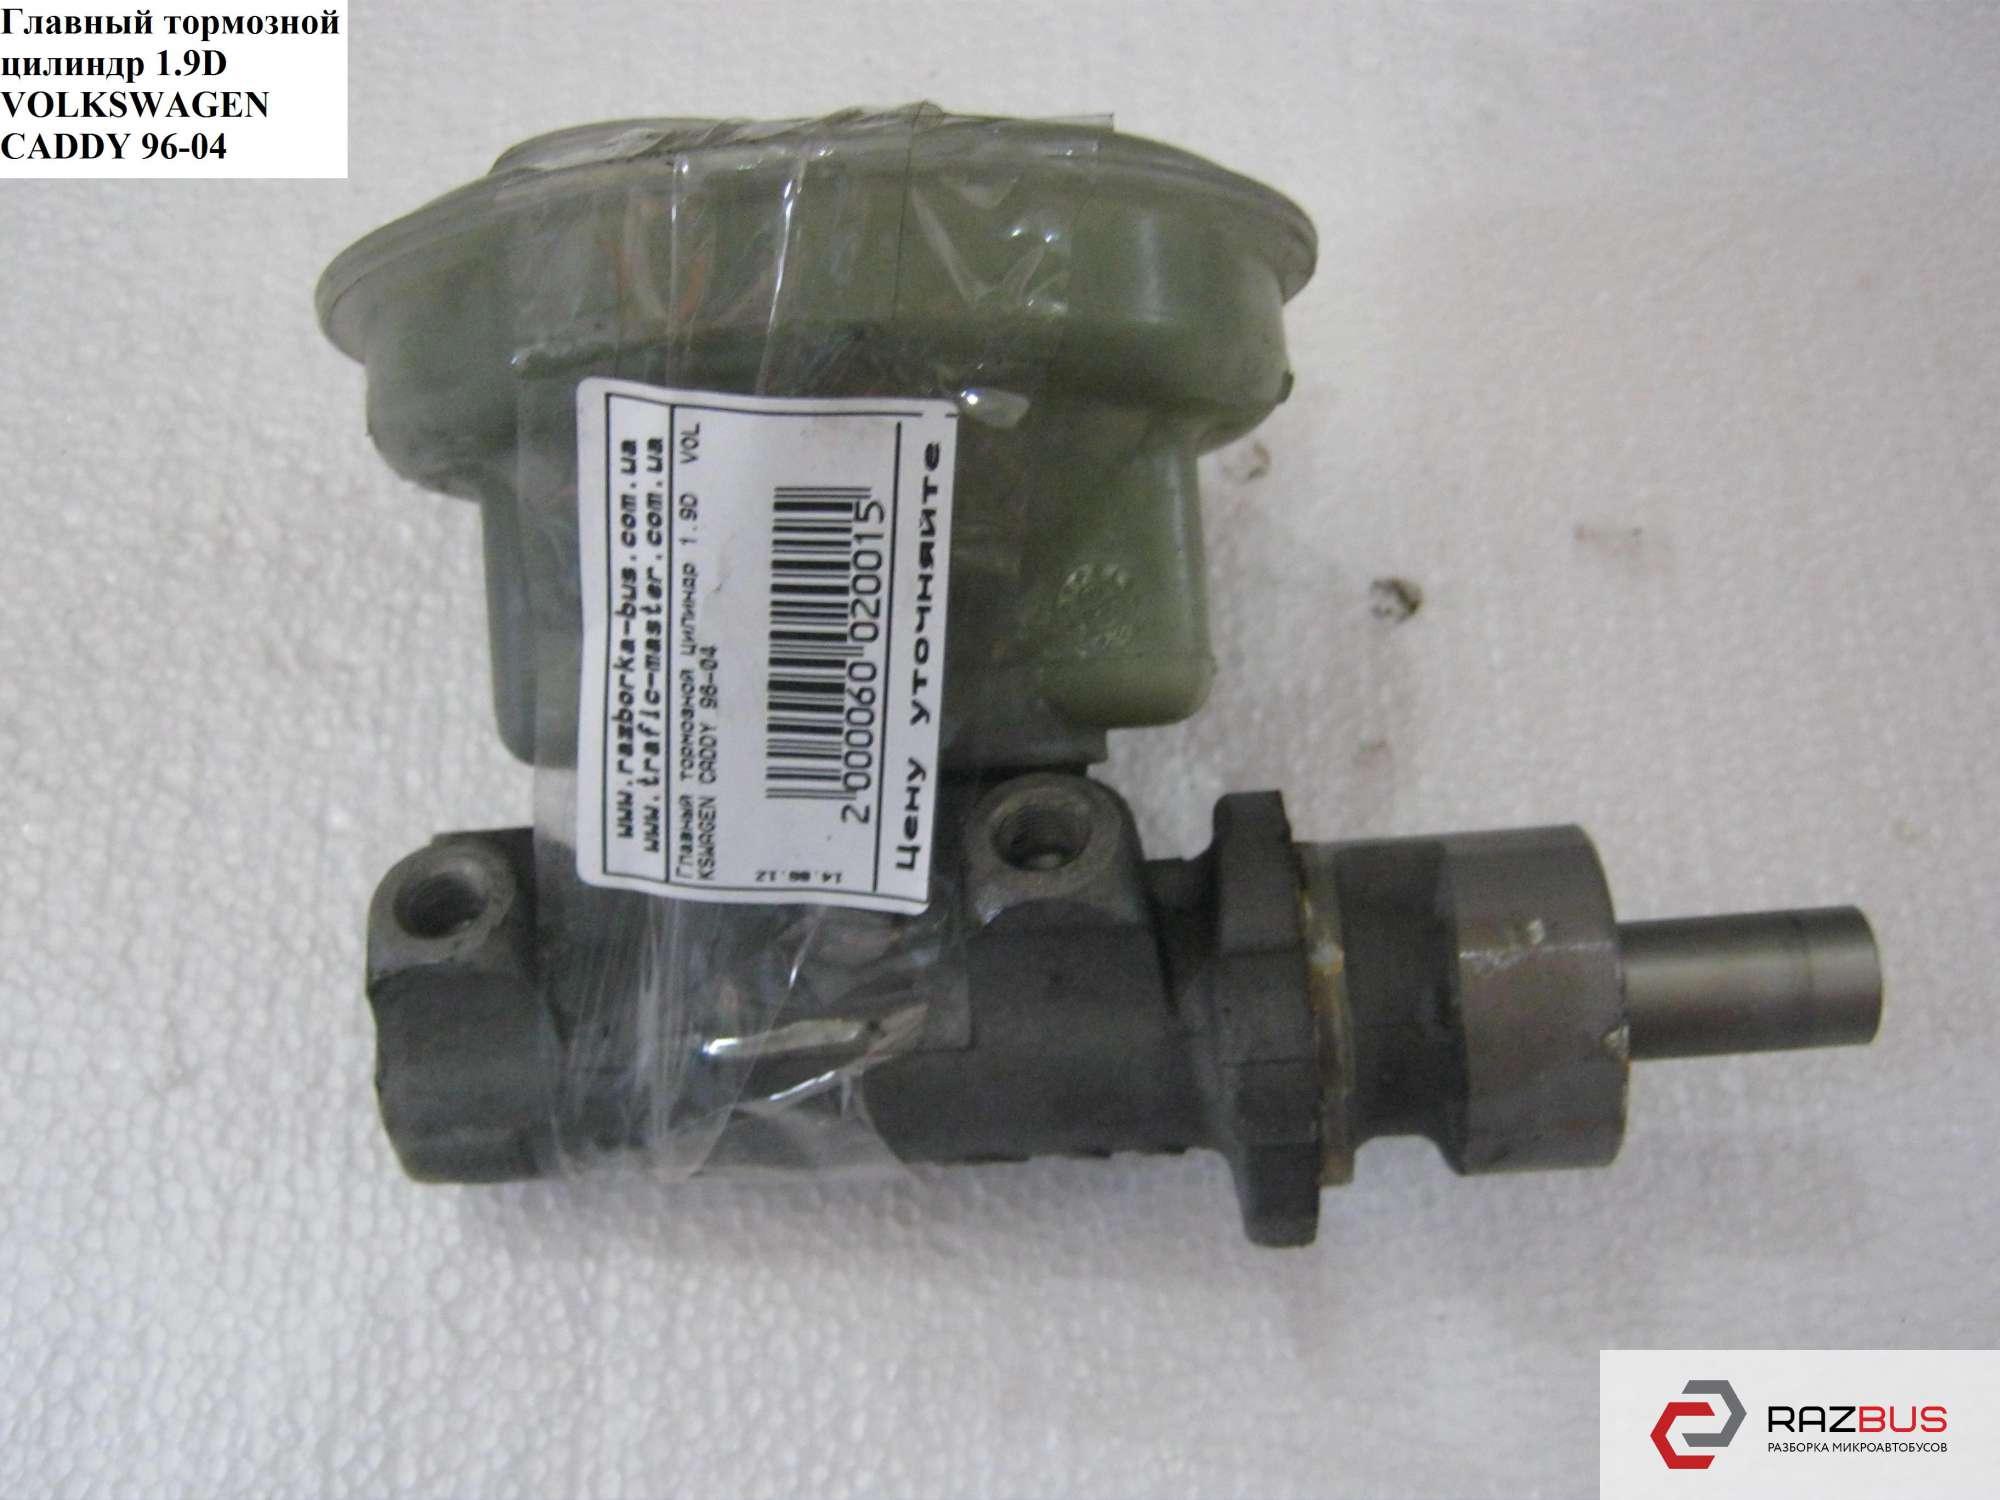 21026499, 357611019B Главный тормозной цилиндр VOLKSWAGEN CADDY II 1995-2004г